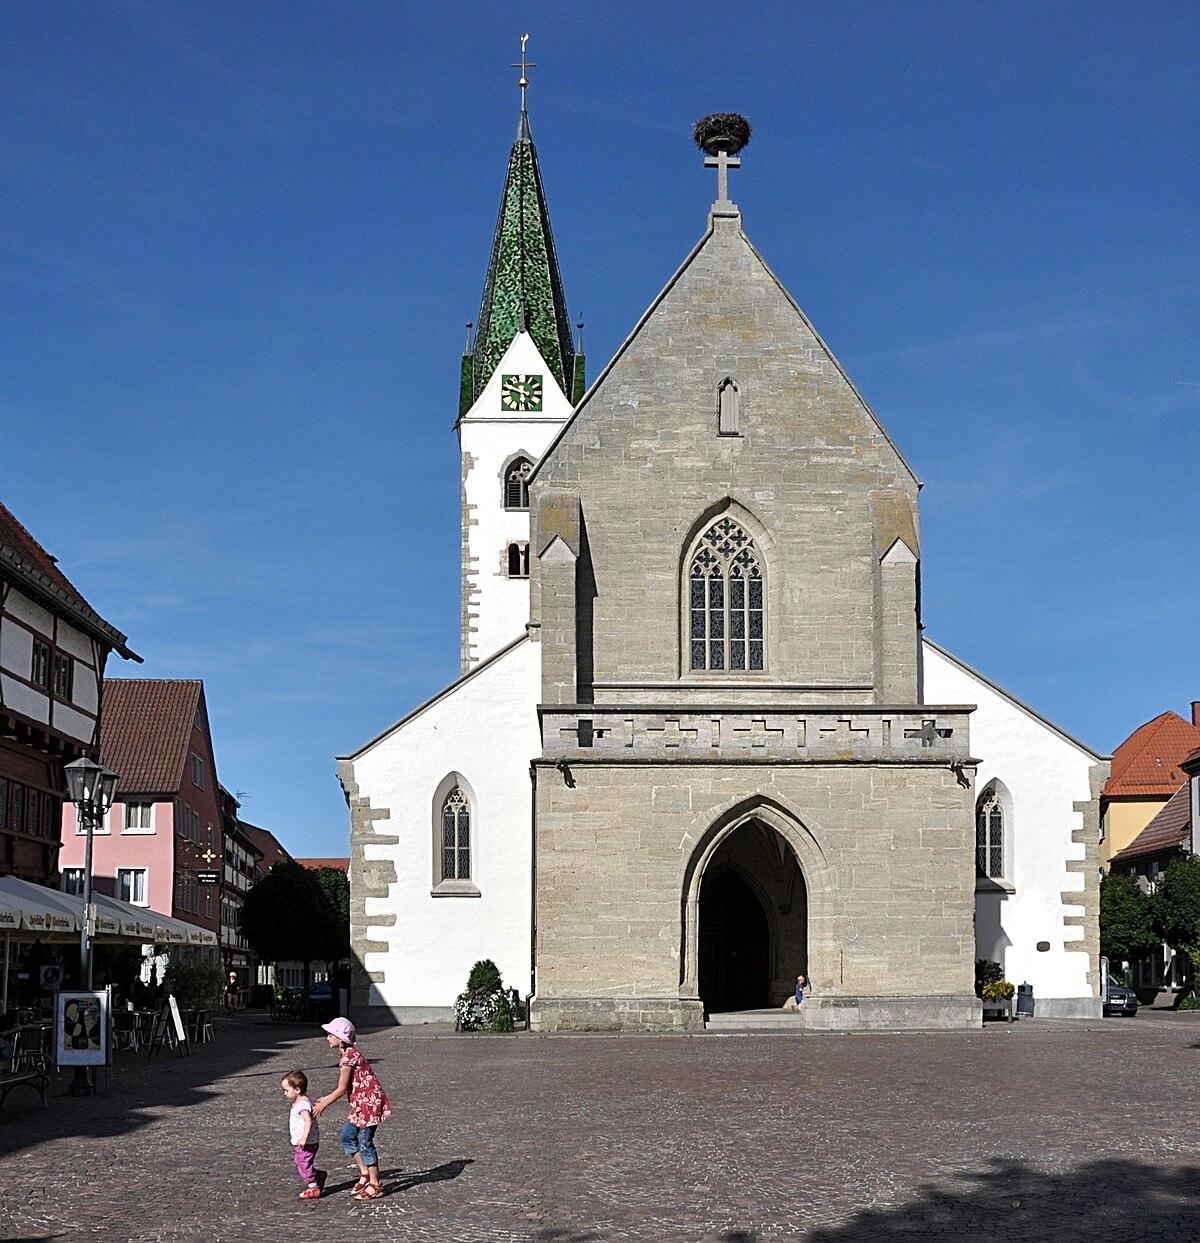 Mädchen aus Bad Saulgau